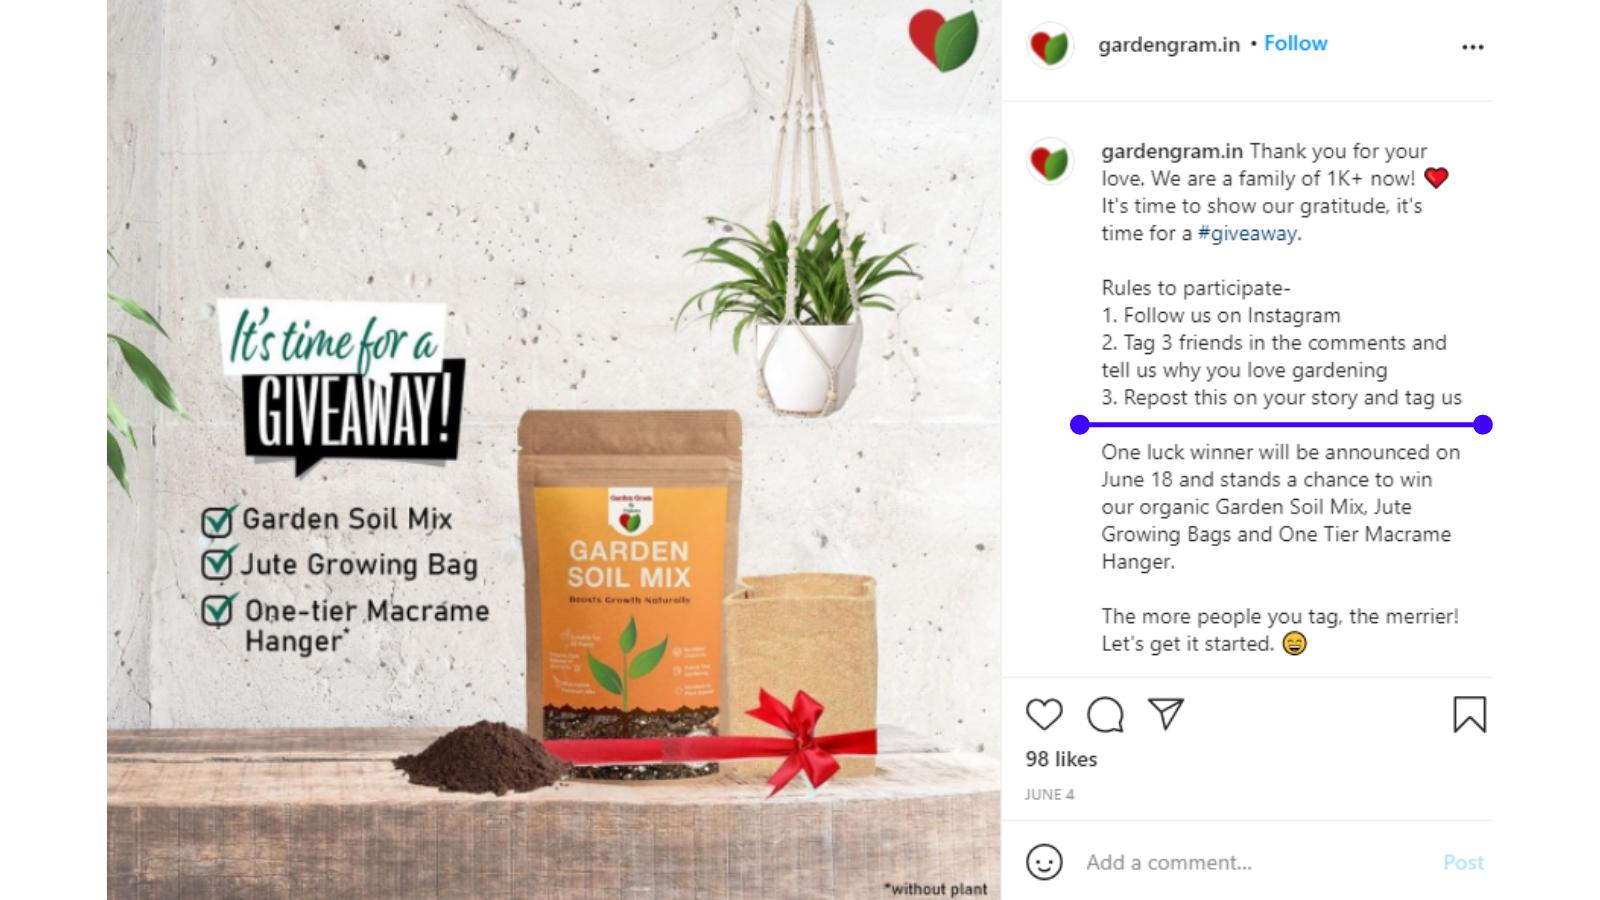 Repost-hashtag-contest